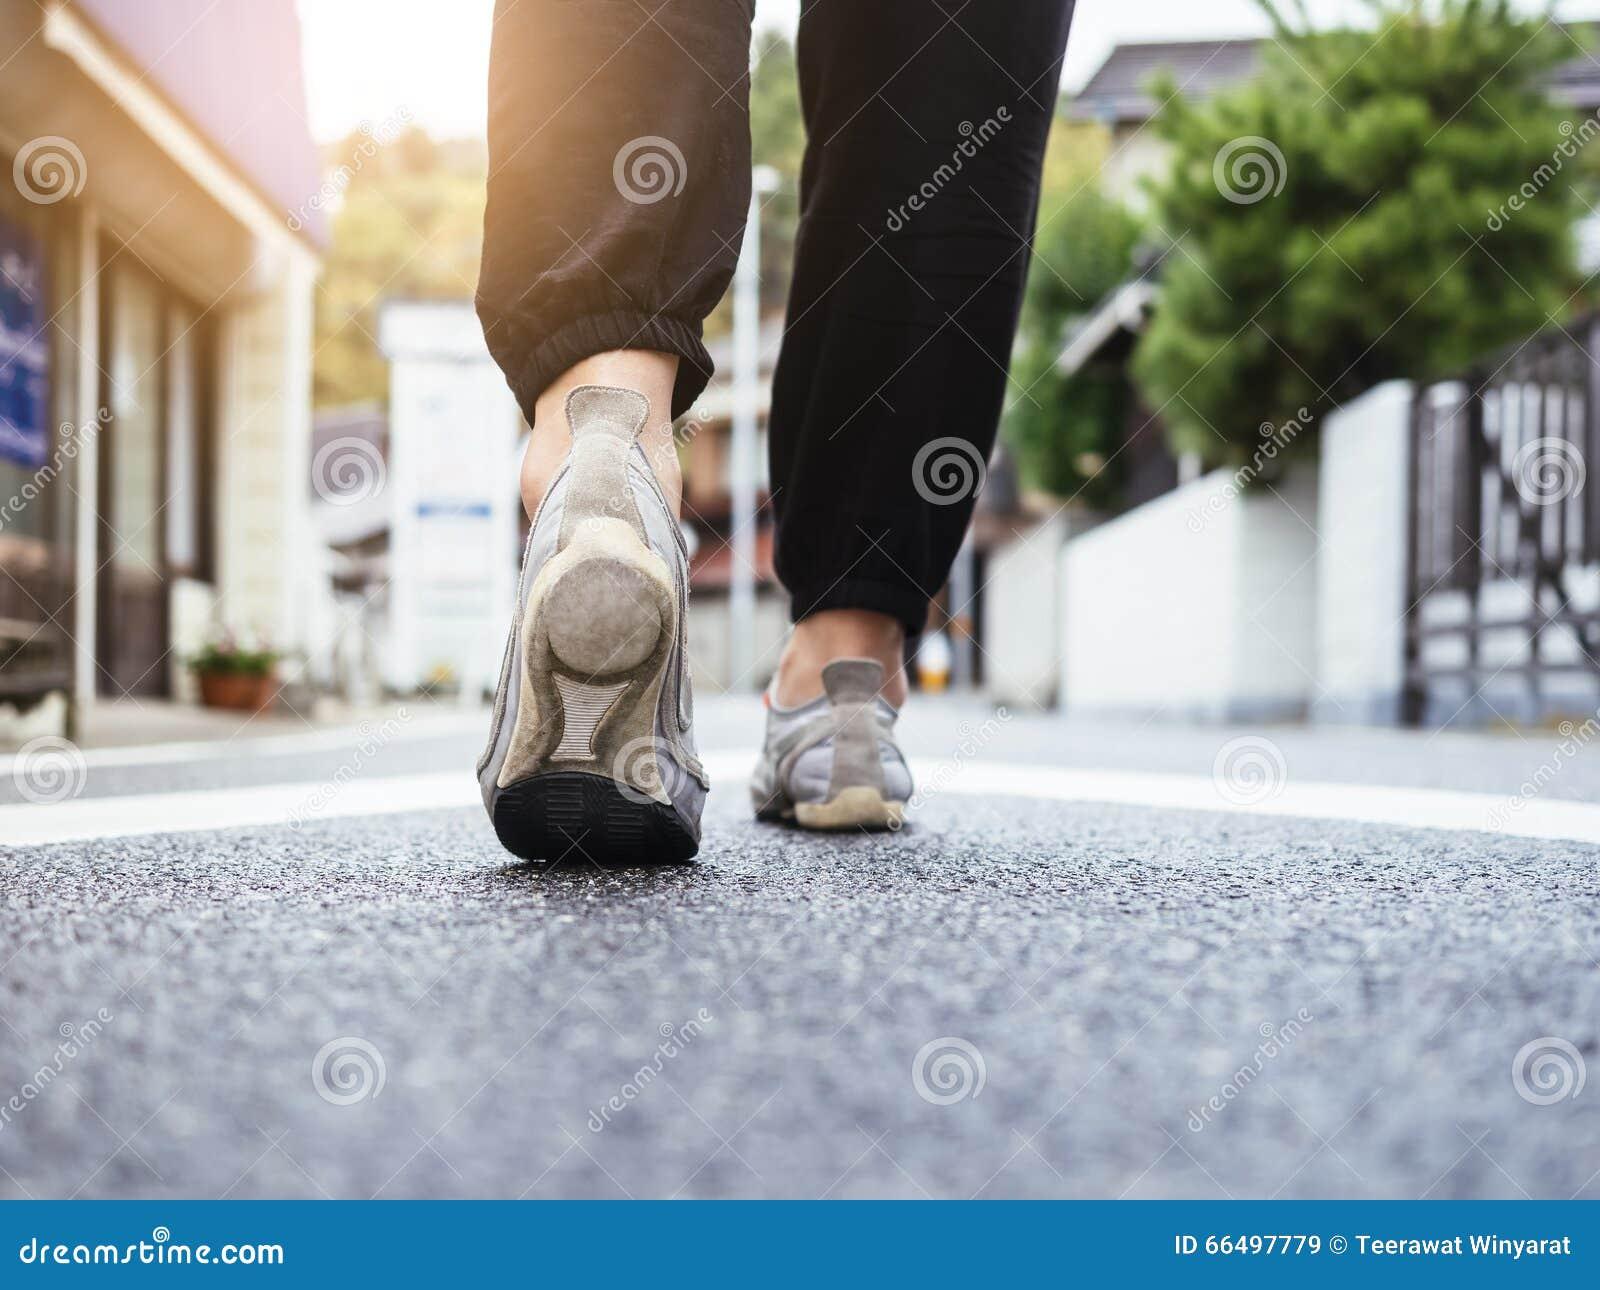 Woman Walking on Street Outdoor Urban in morning